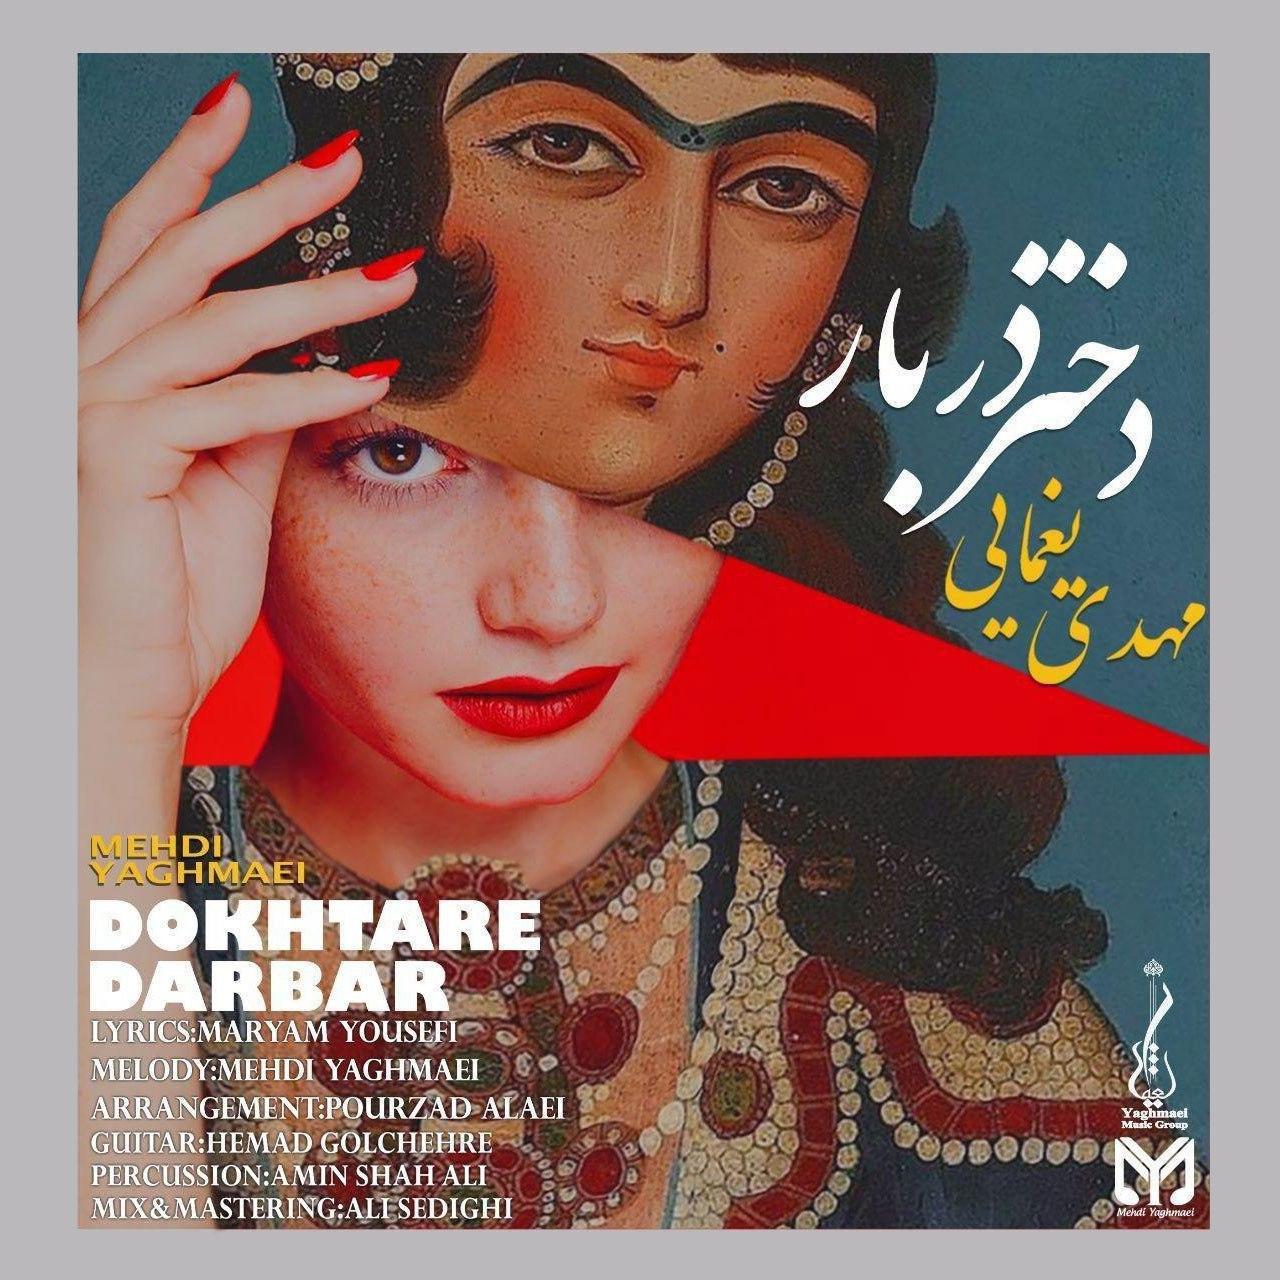 Mehdi Yaghmaei - Dokhtar Darbar - دانلود آهنگ مهدی یغمایی به نام دختر دربار